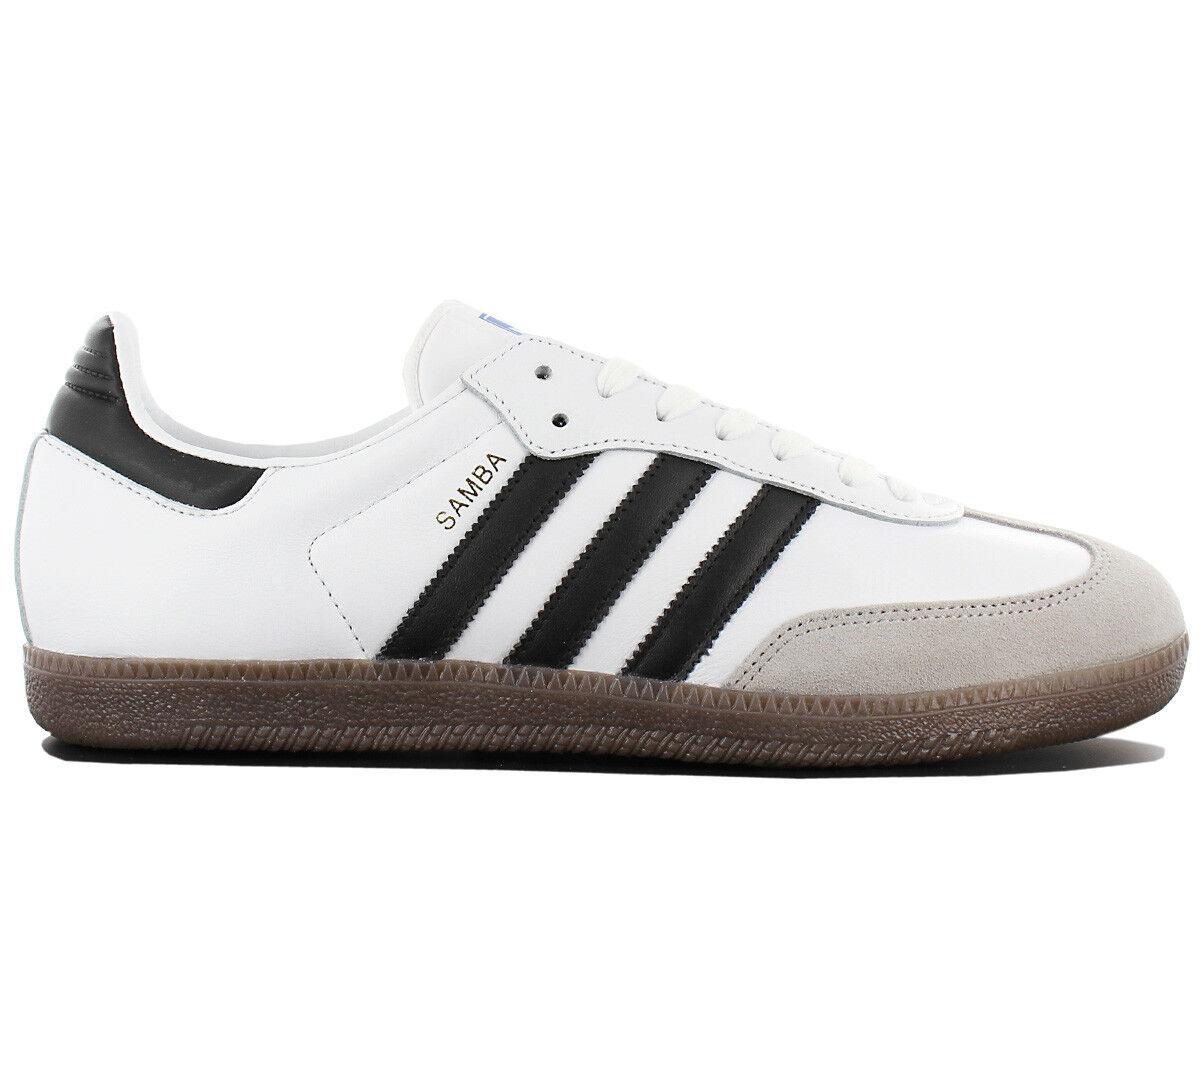 adidas Originals Samba Leather OG Herren Sneaker Schuhe Leder Retro BB2588 Weiß